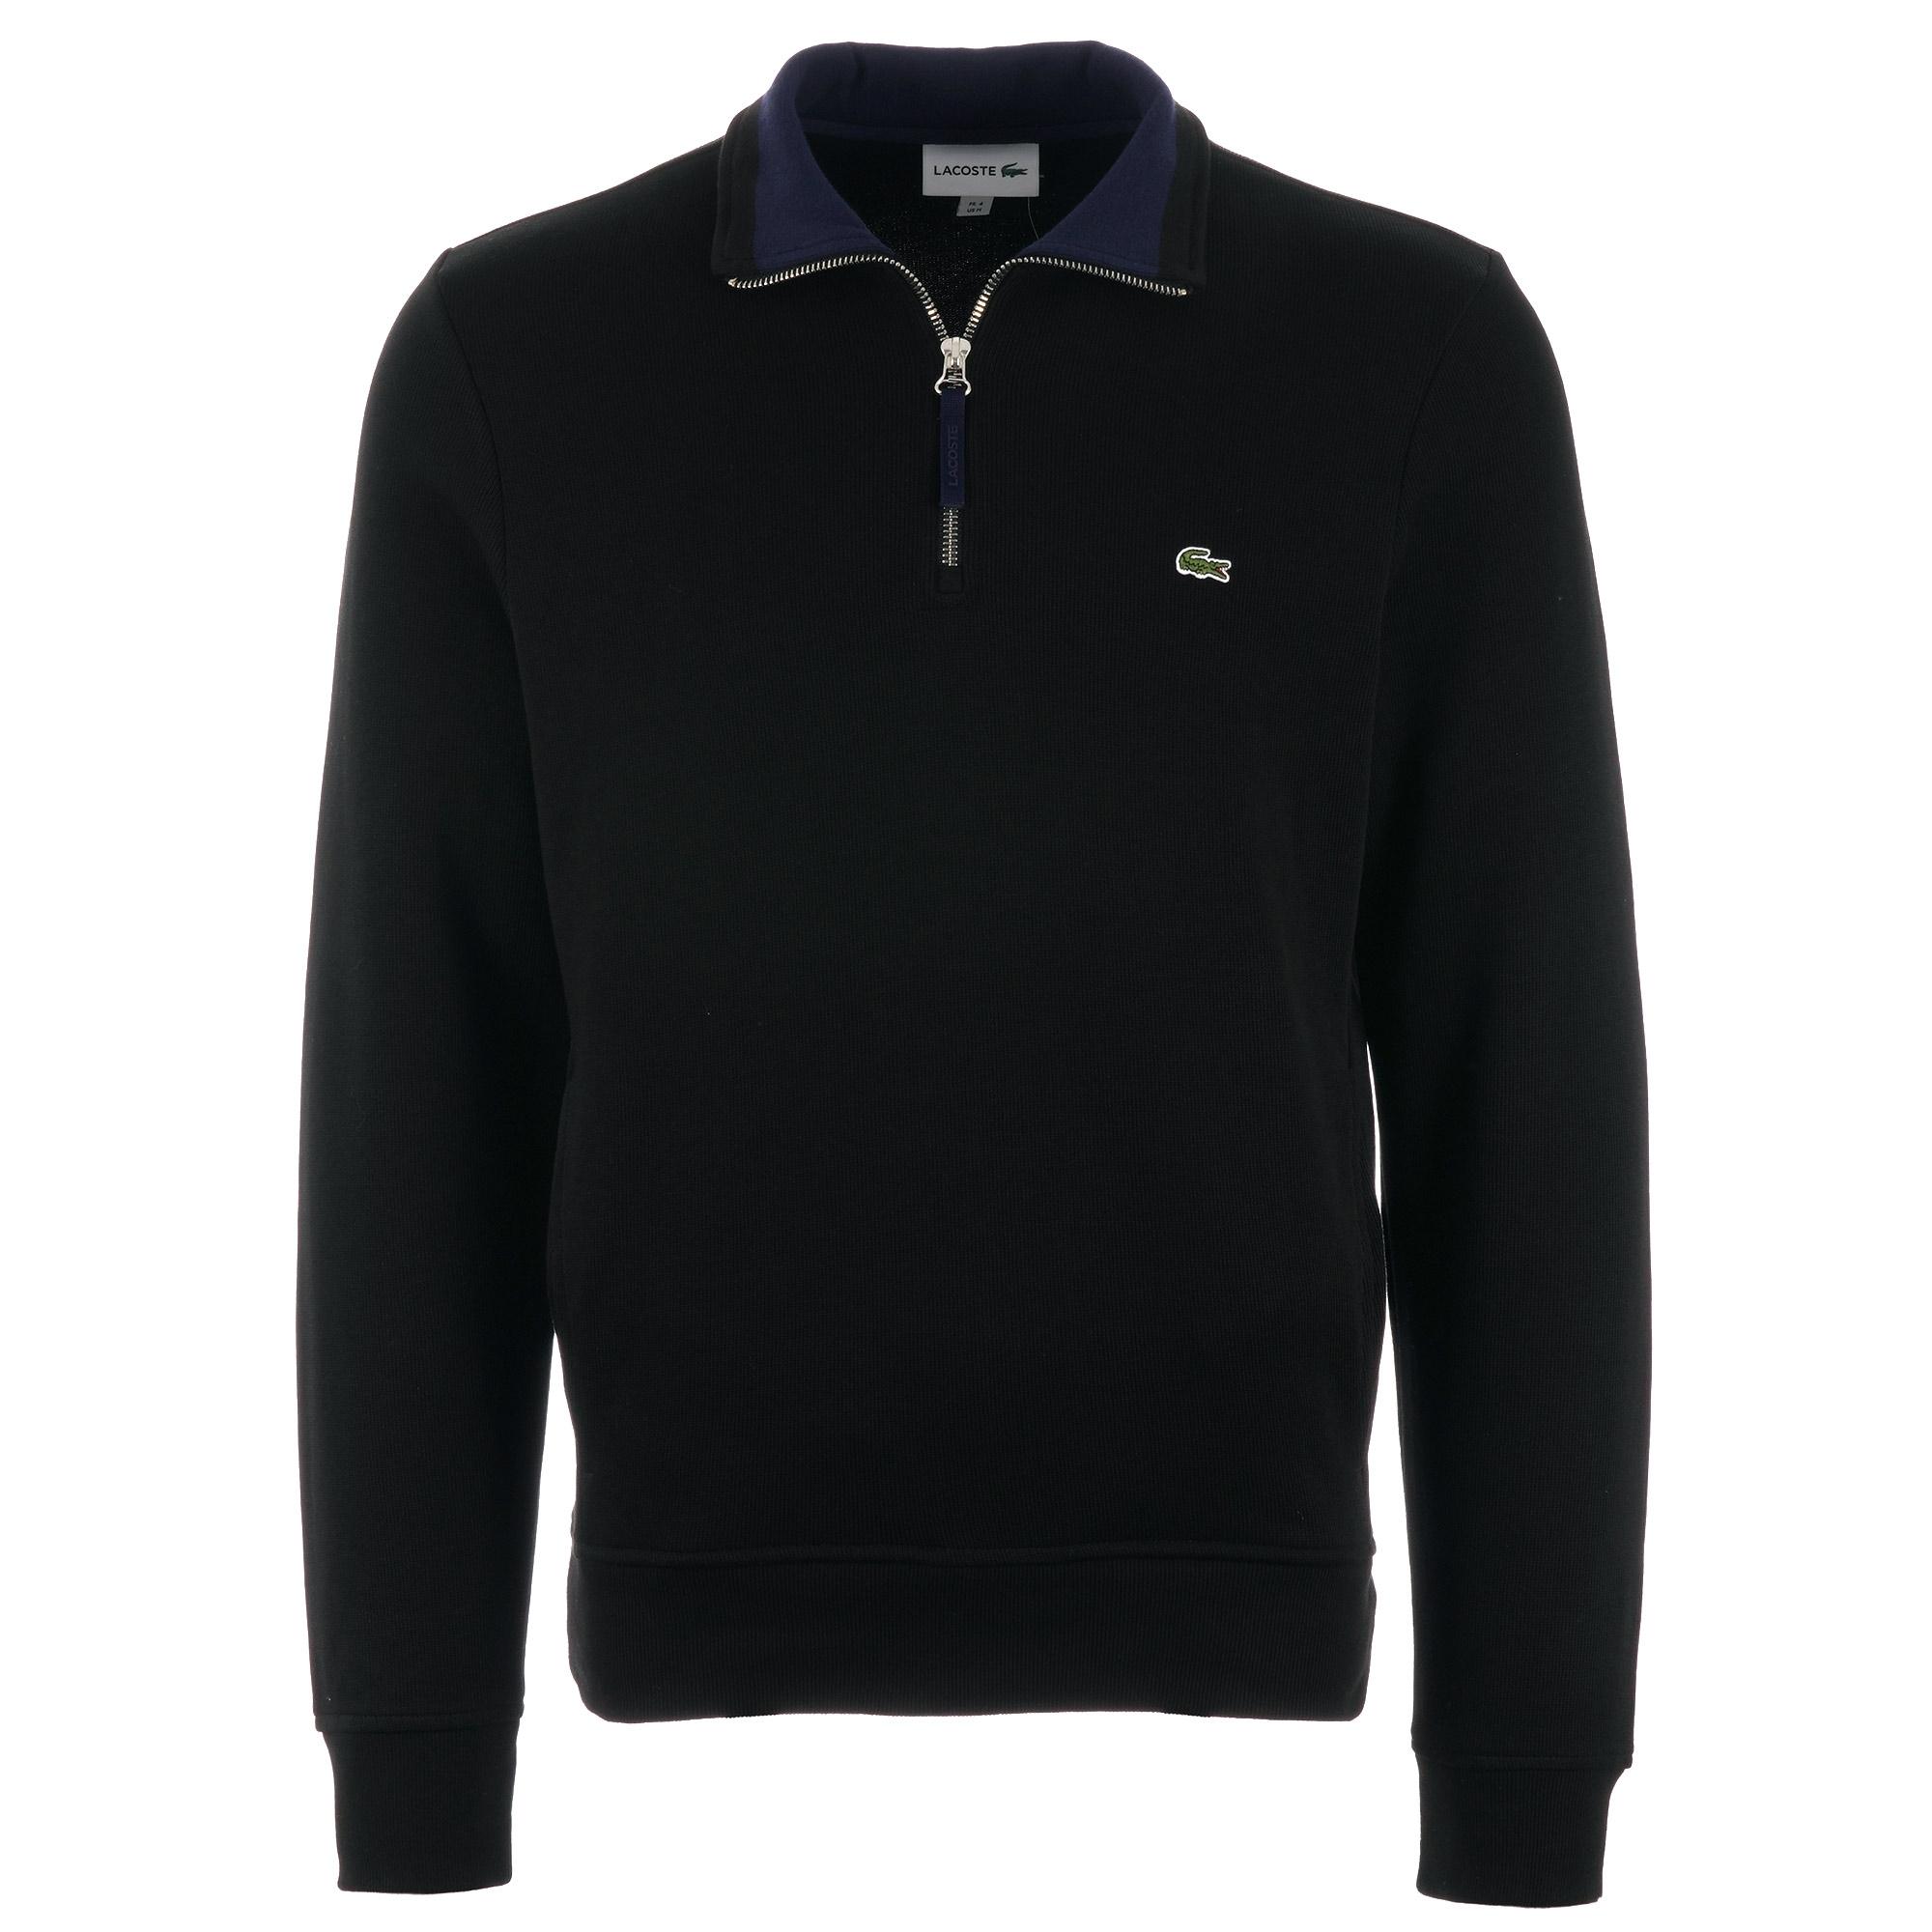 lacoste jumper black